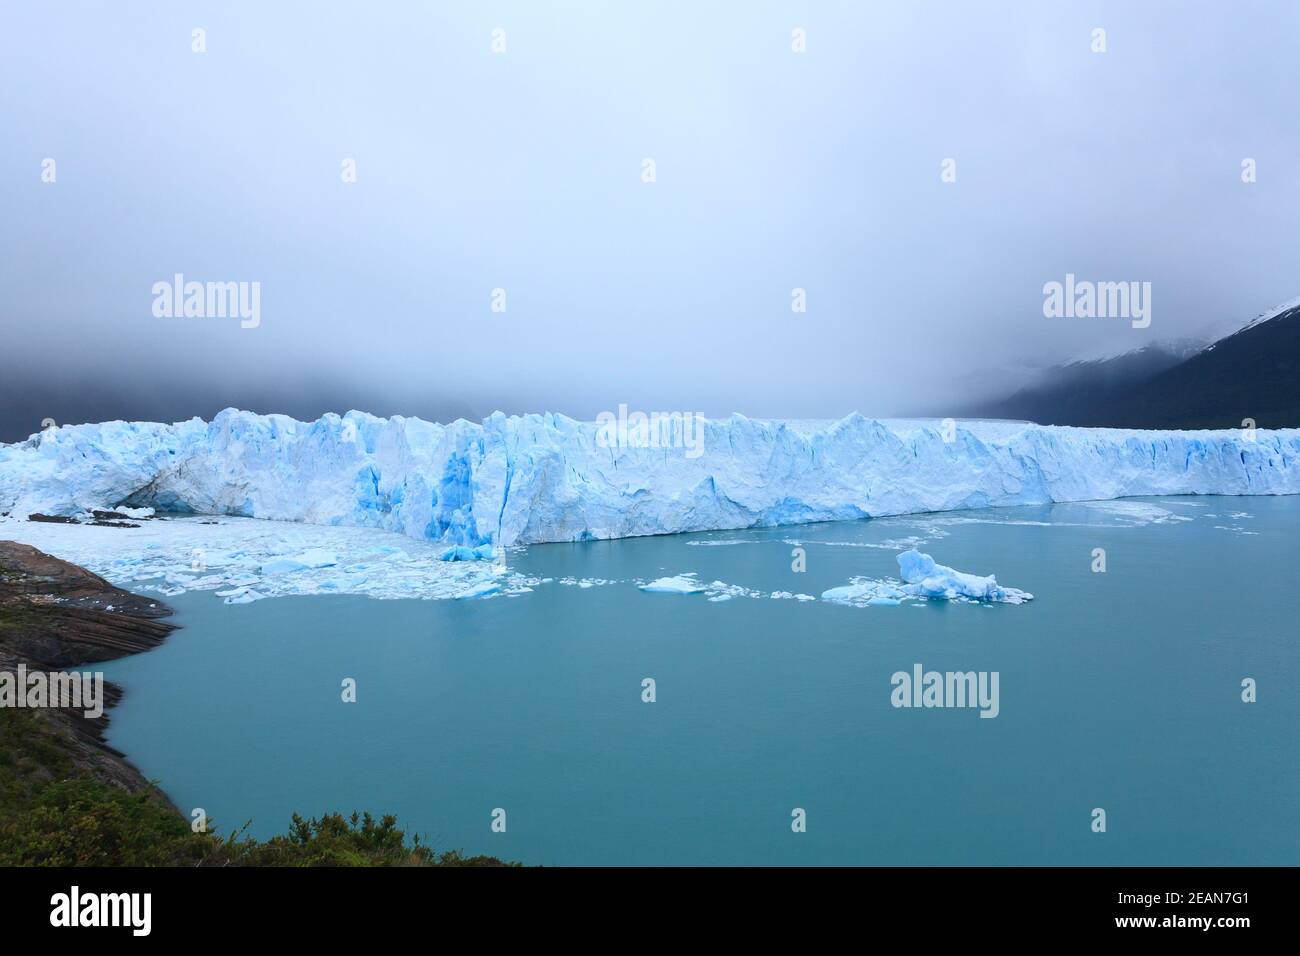 Vista del glaciar Perito Moreno, paisaje de la Patagonia, Argentina Foto de stock